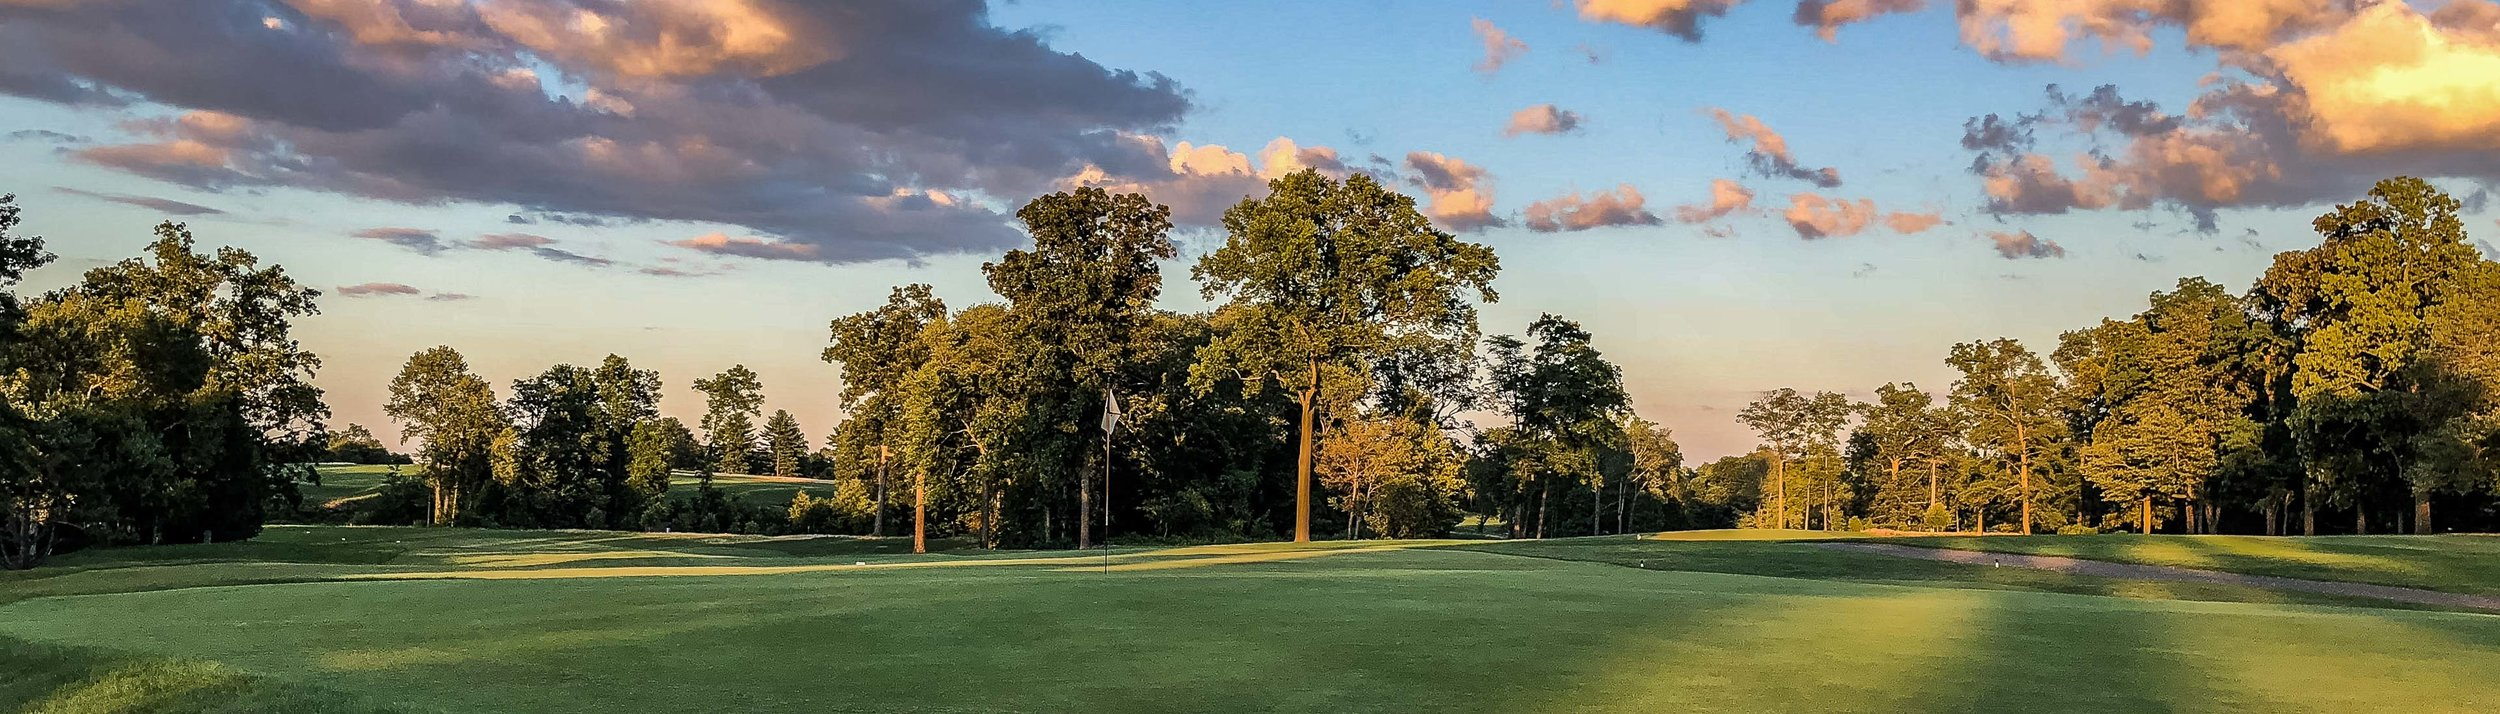 SCC 2018 Golf #18-HAP (2 of 2).jpg